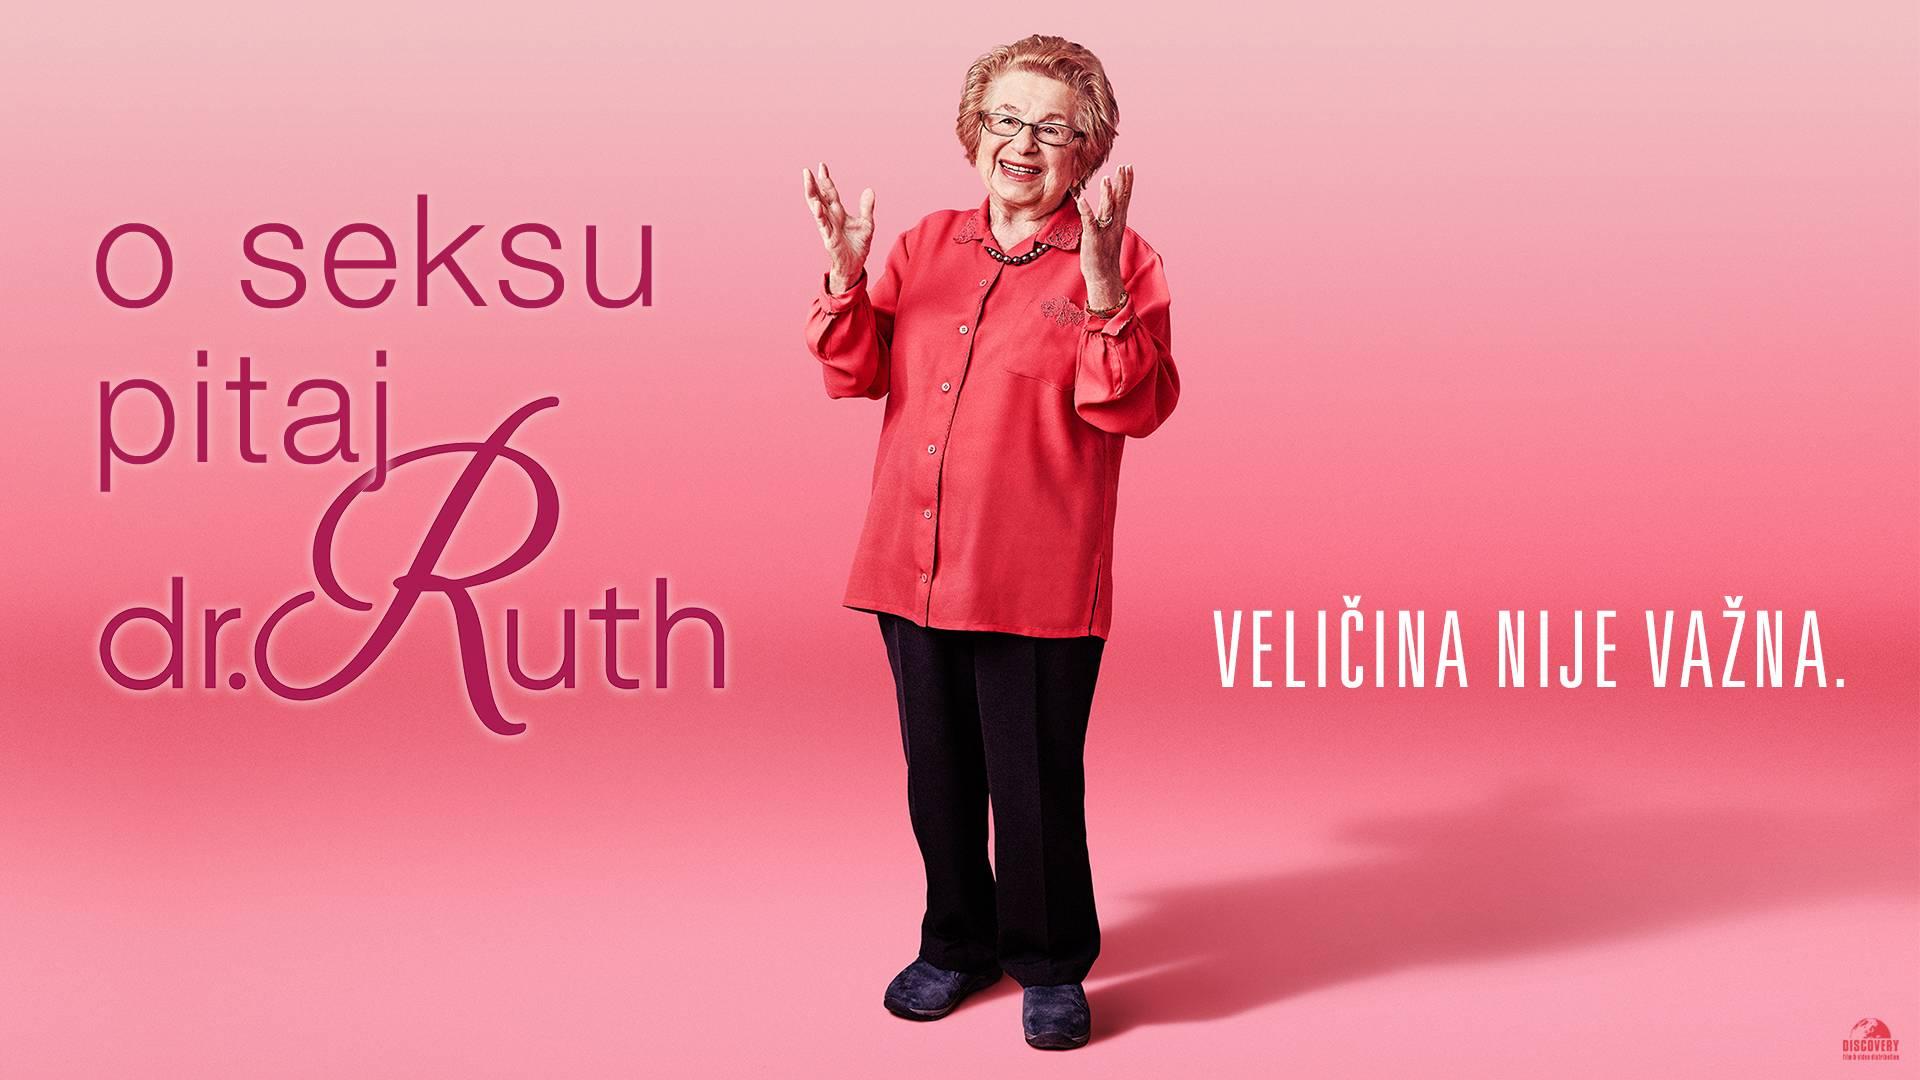 O seksu pitaj dr. Ruth